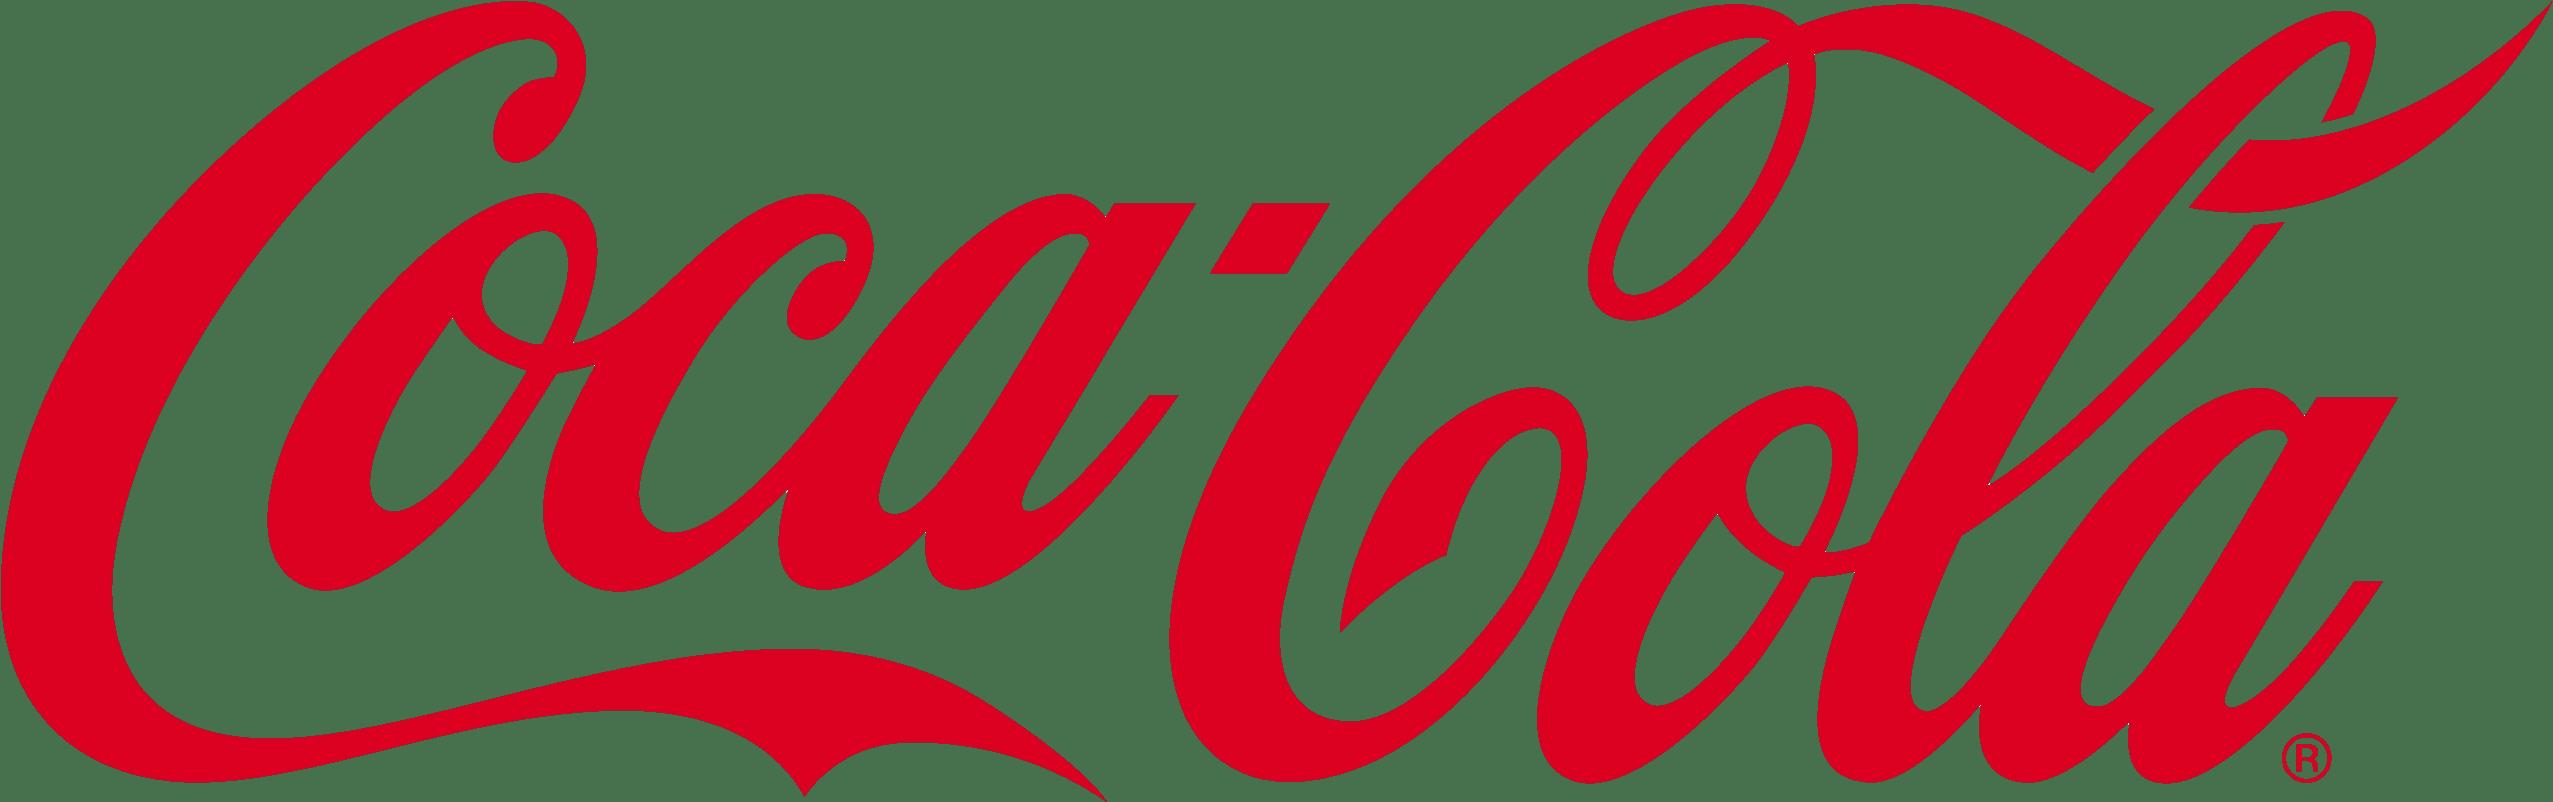 Coca_Cola-Logo